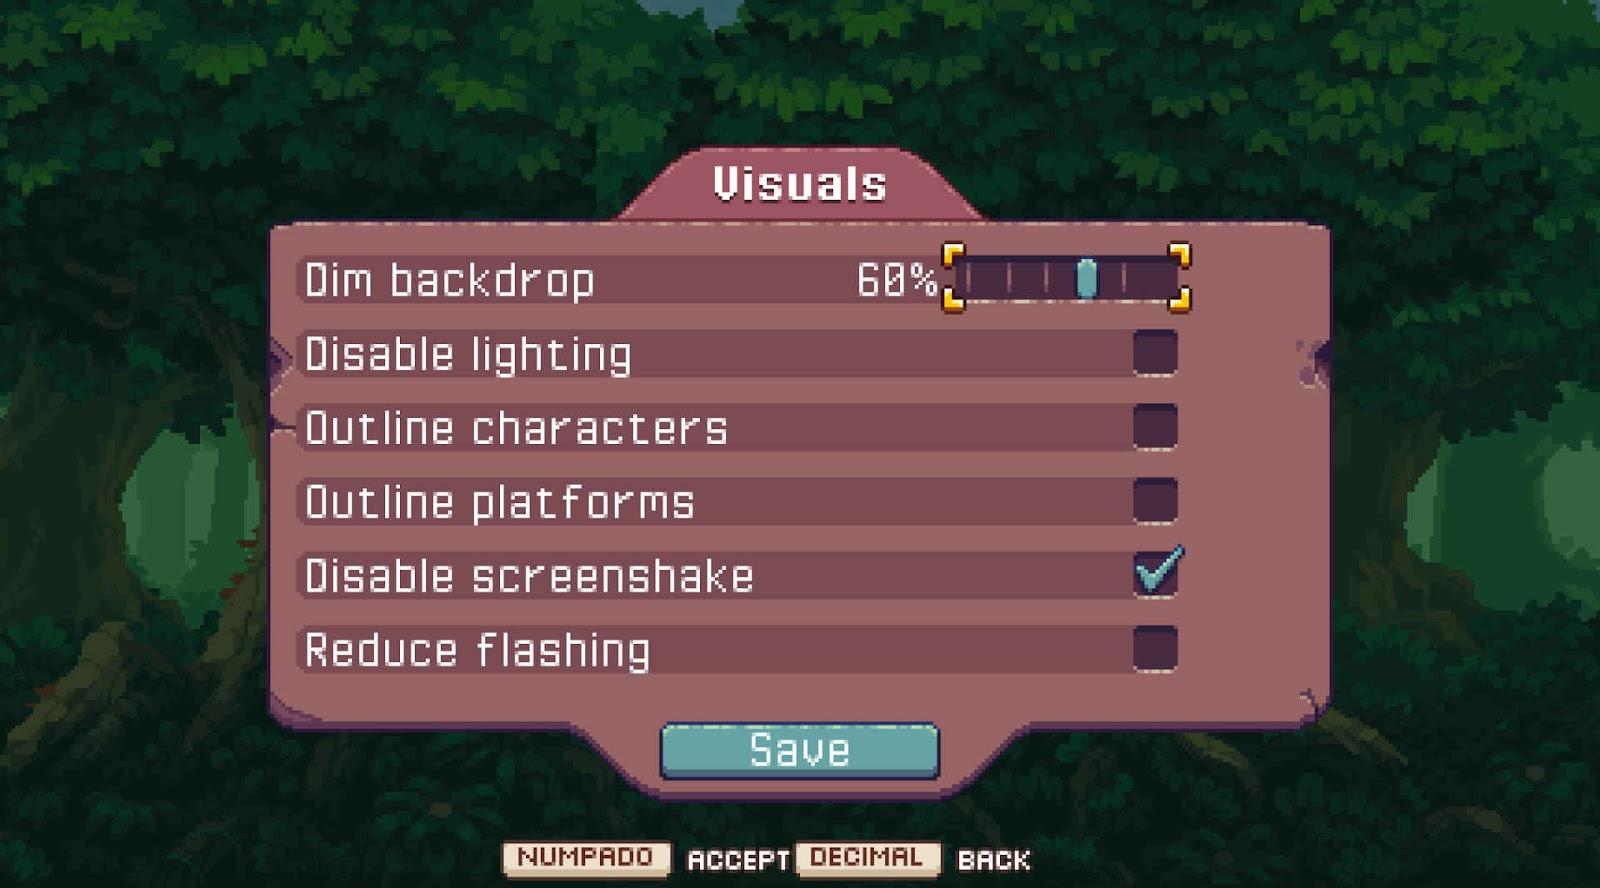 Dim backdrop, disable lighting, outline characters, outline platforms, disable screenshake, reduce flashing.